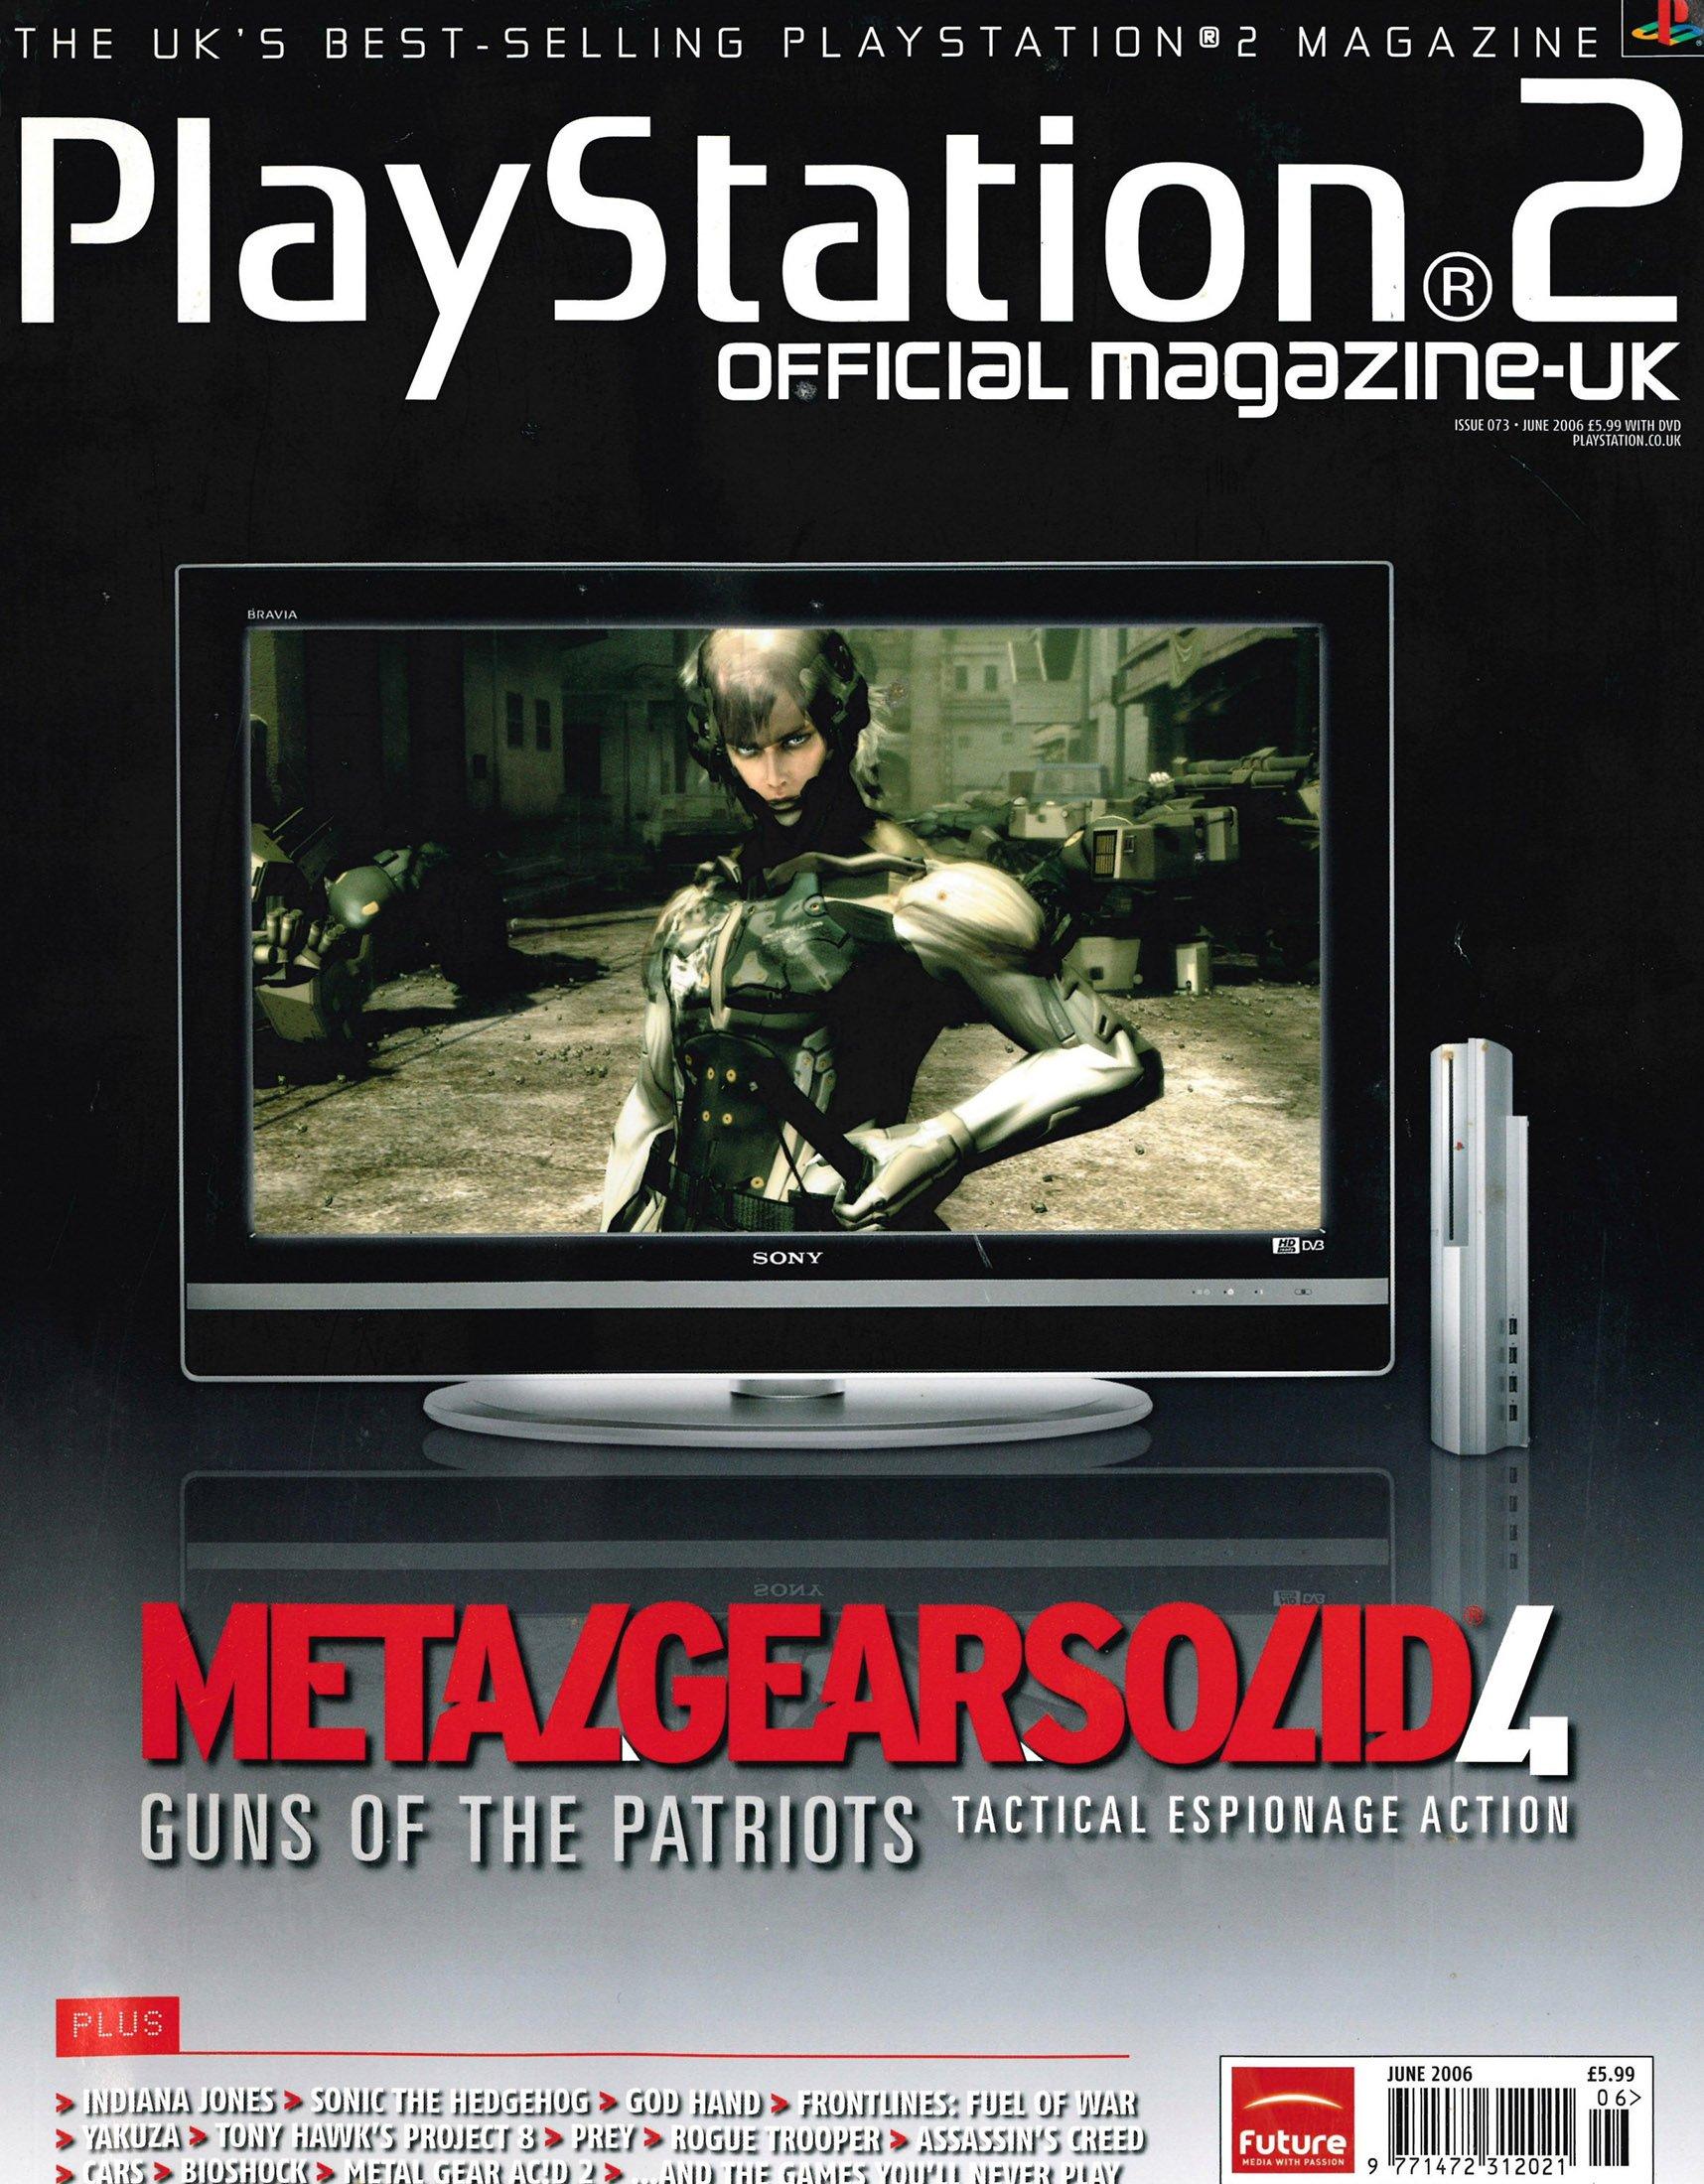 Official Playstation 2 Magazine UK 073 (June 2006)